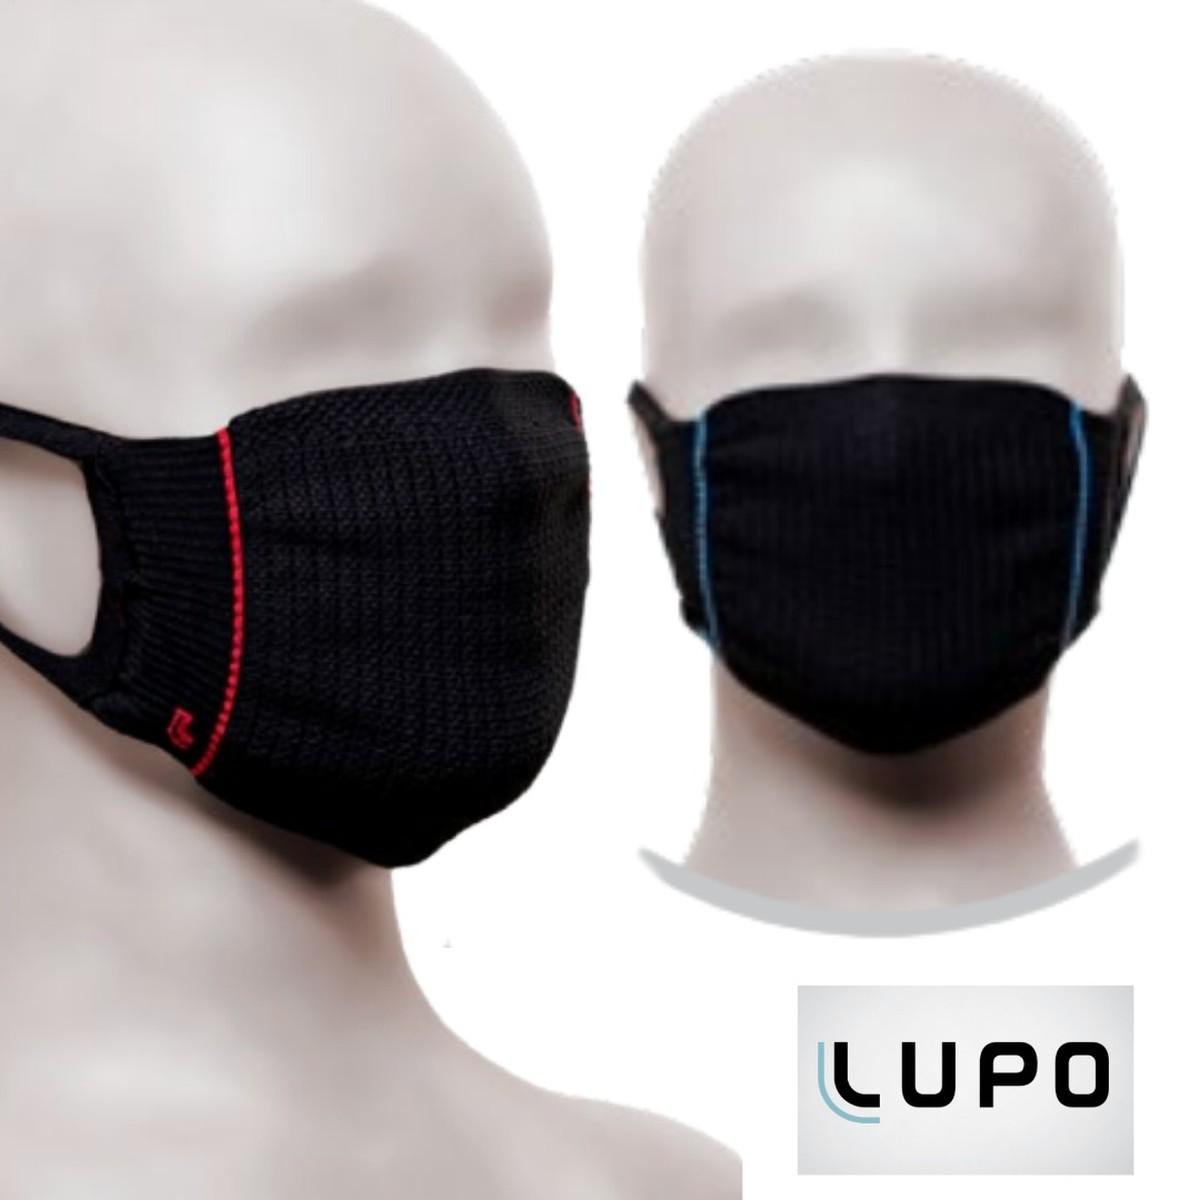 Máscara Lupo Infantil Zero Costura Bac-Off - Kit c/ 2und